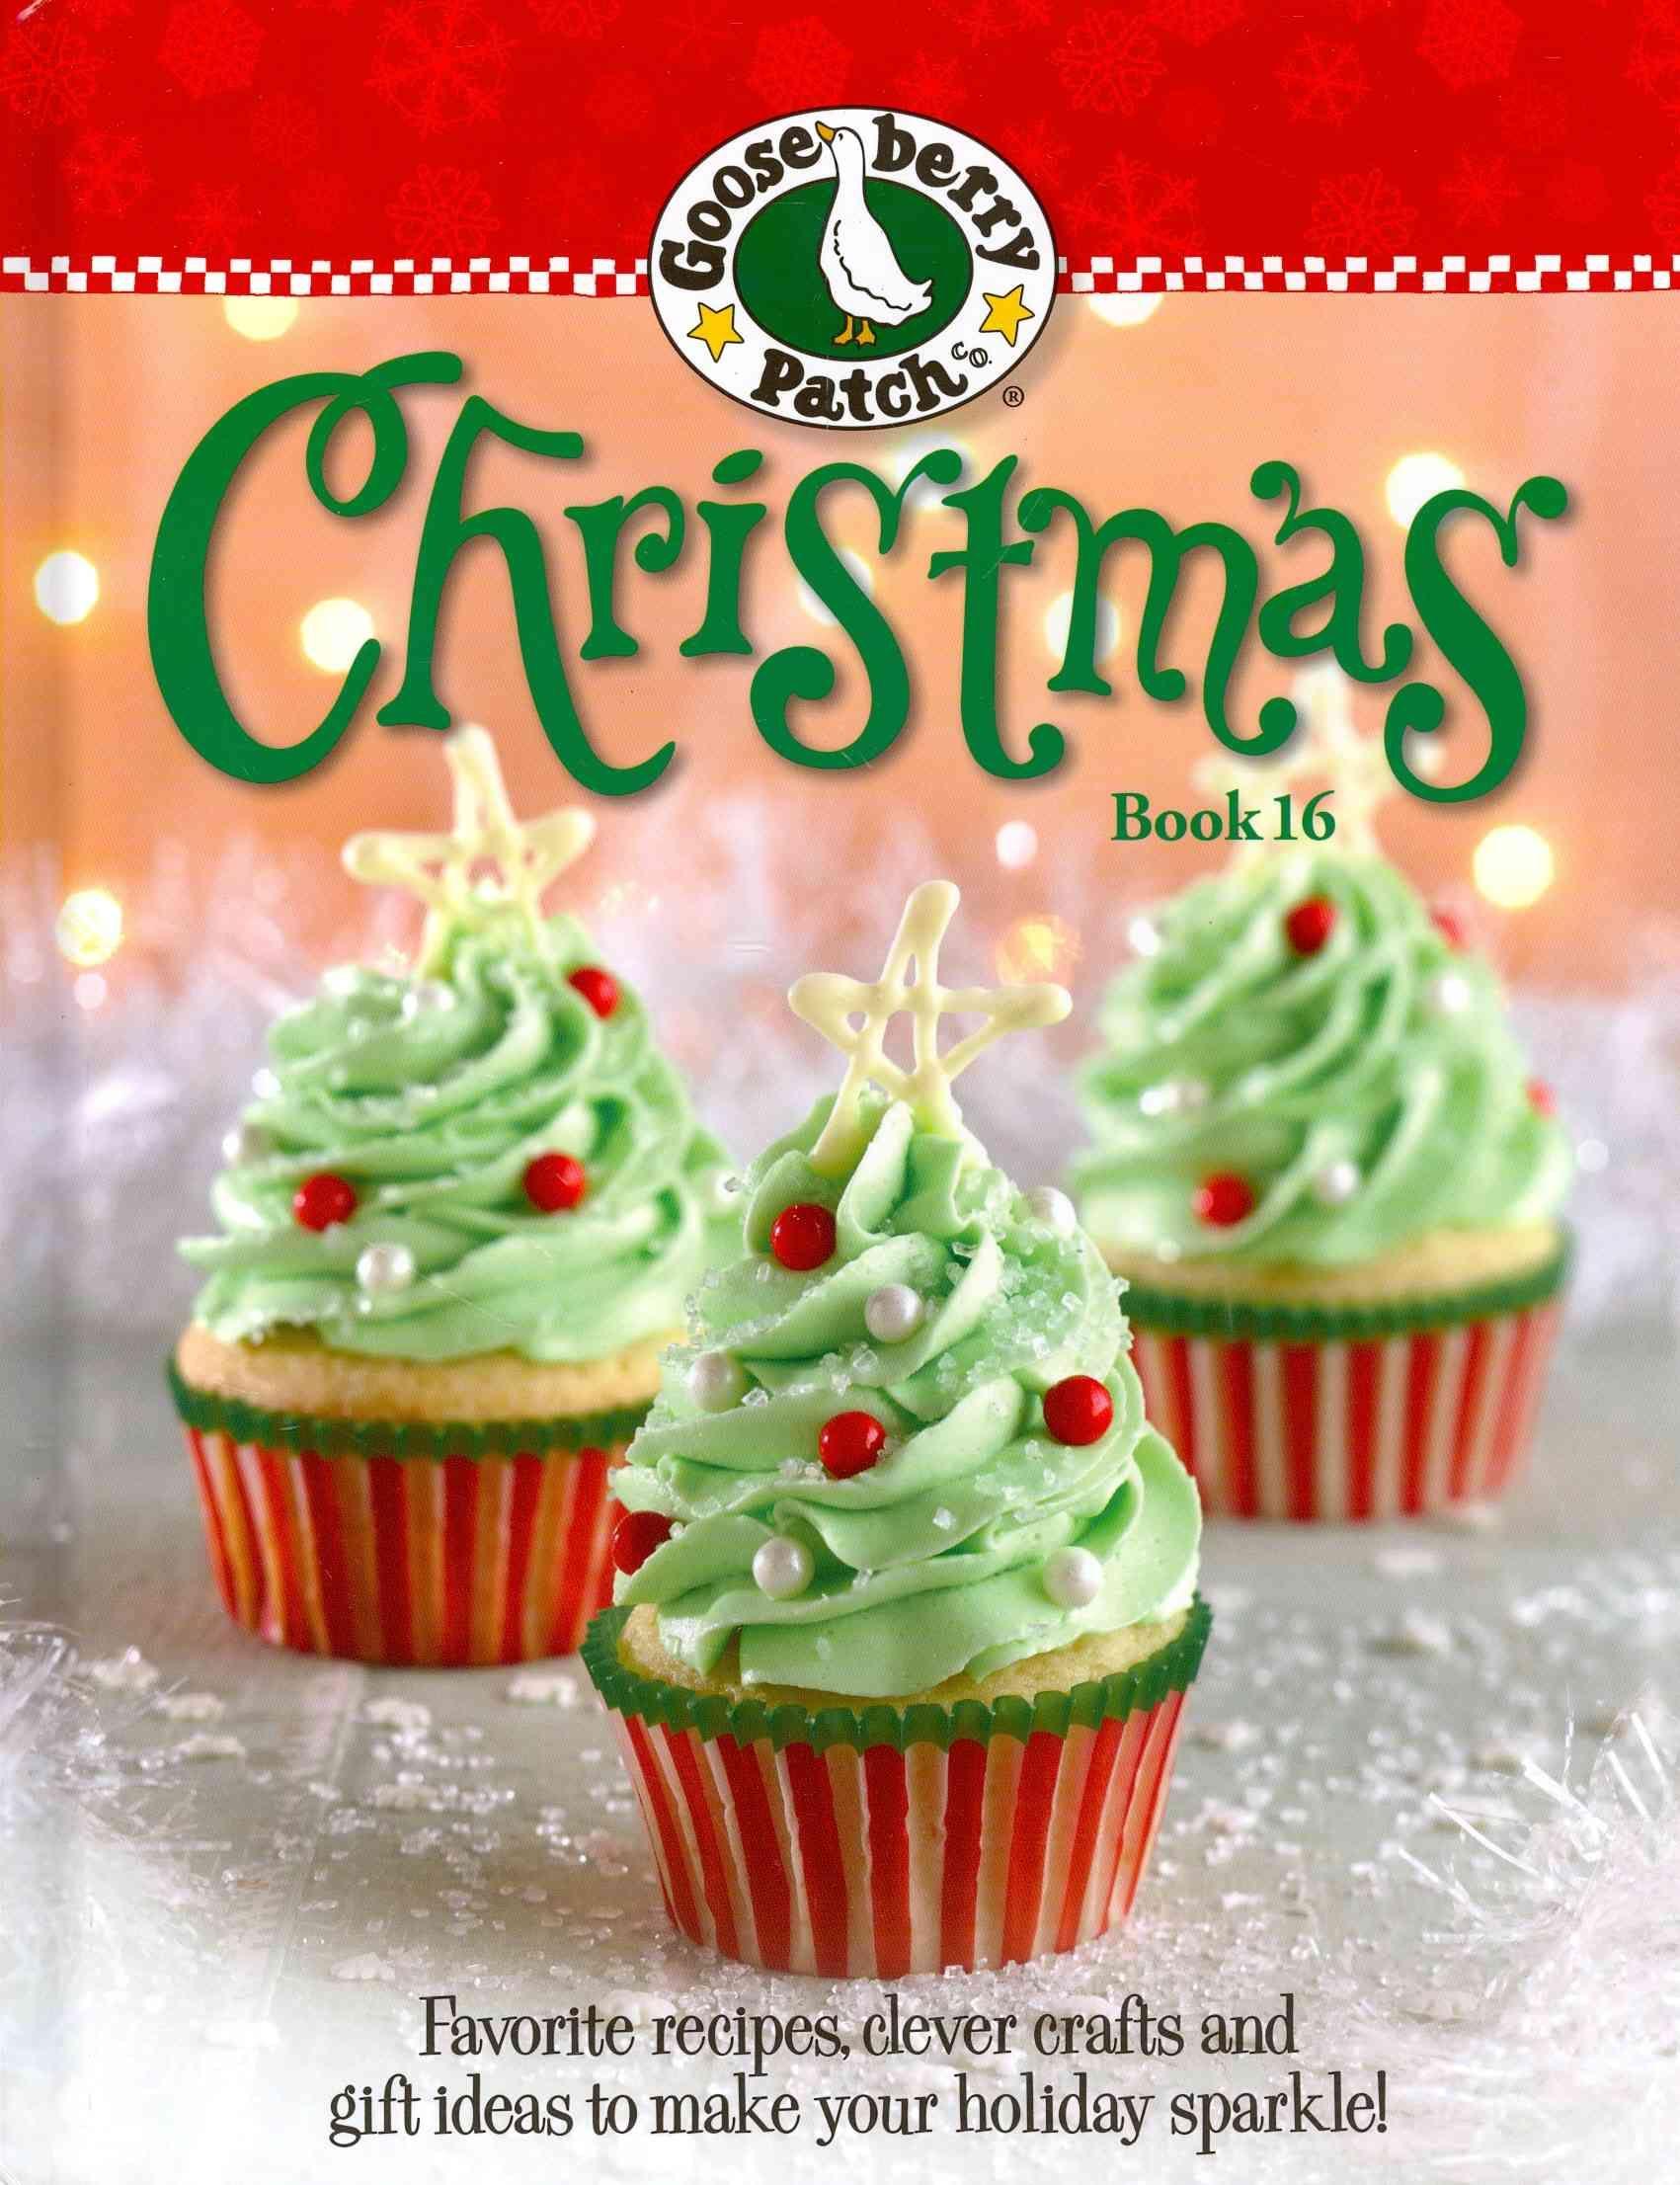 Gooseberry patch christmas book 16 christmas food